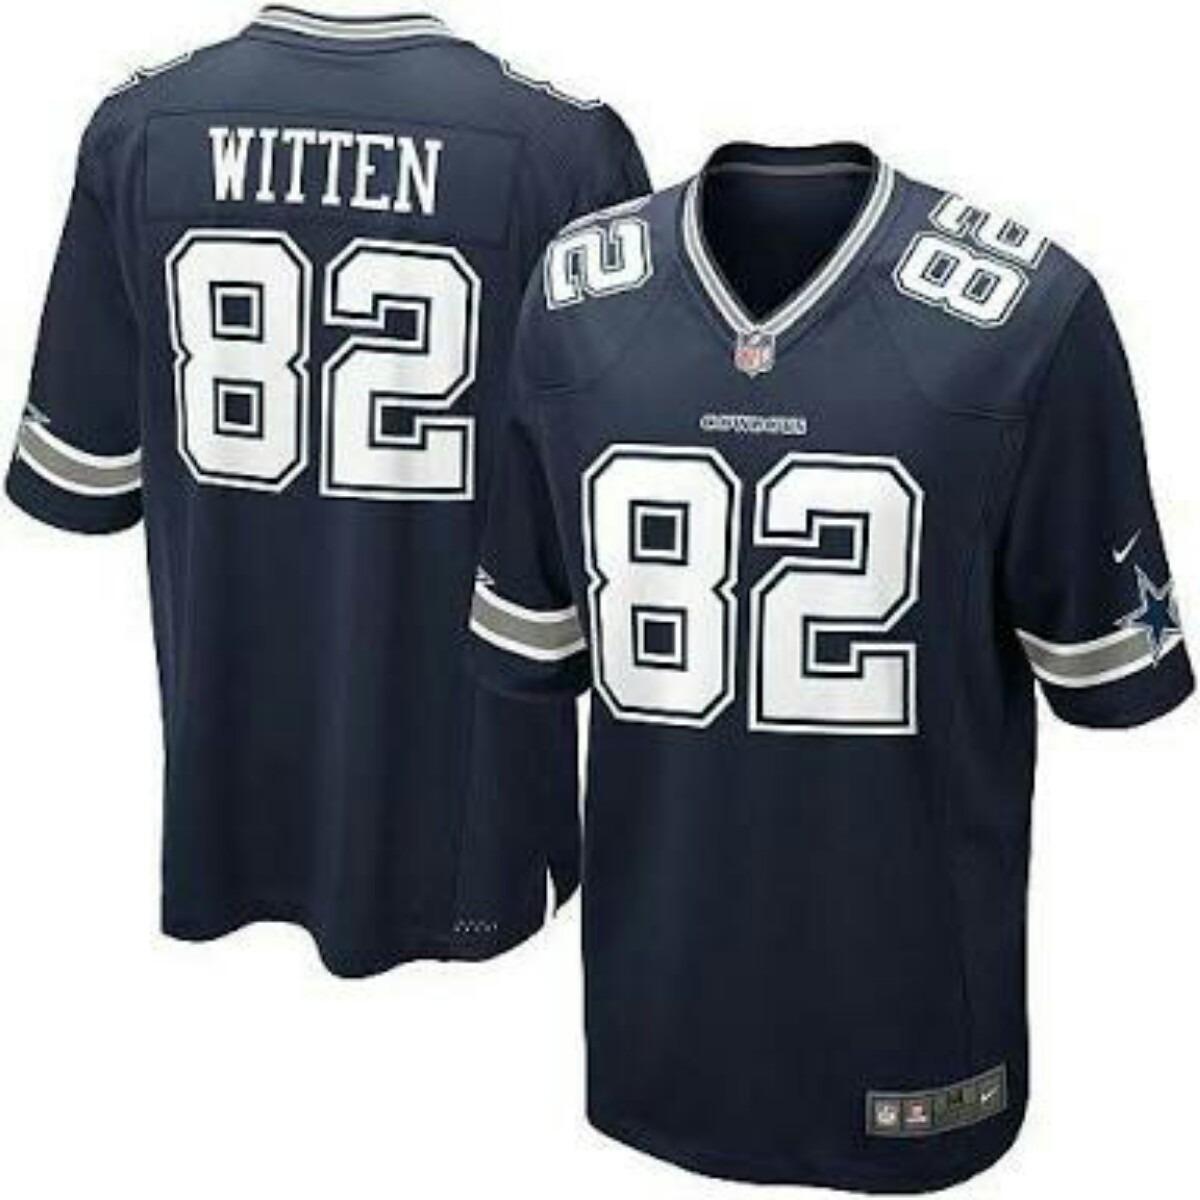 fff5296831352 Camisa futebol americano dalas cowboys bryant elliott carregando zoom jpg  1200x1200 Camisetas de football americano